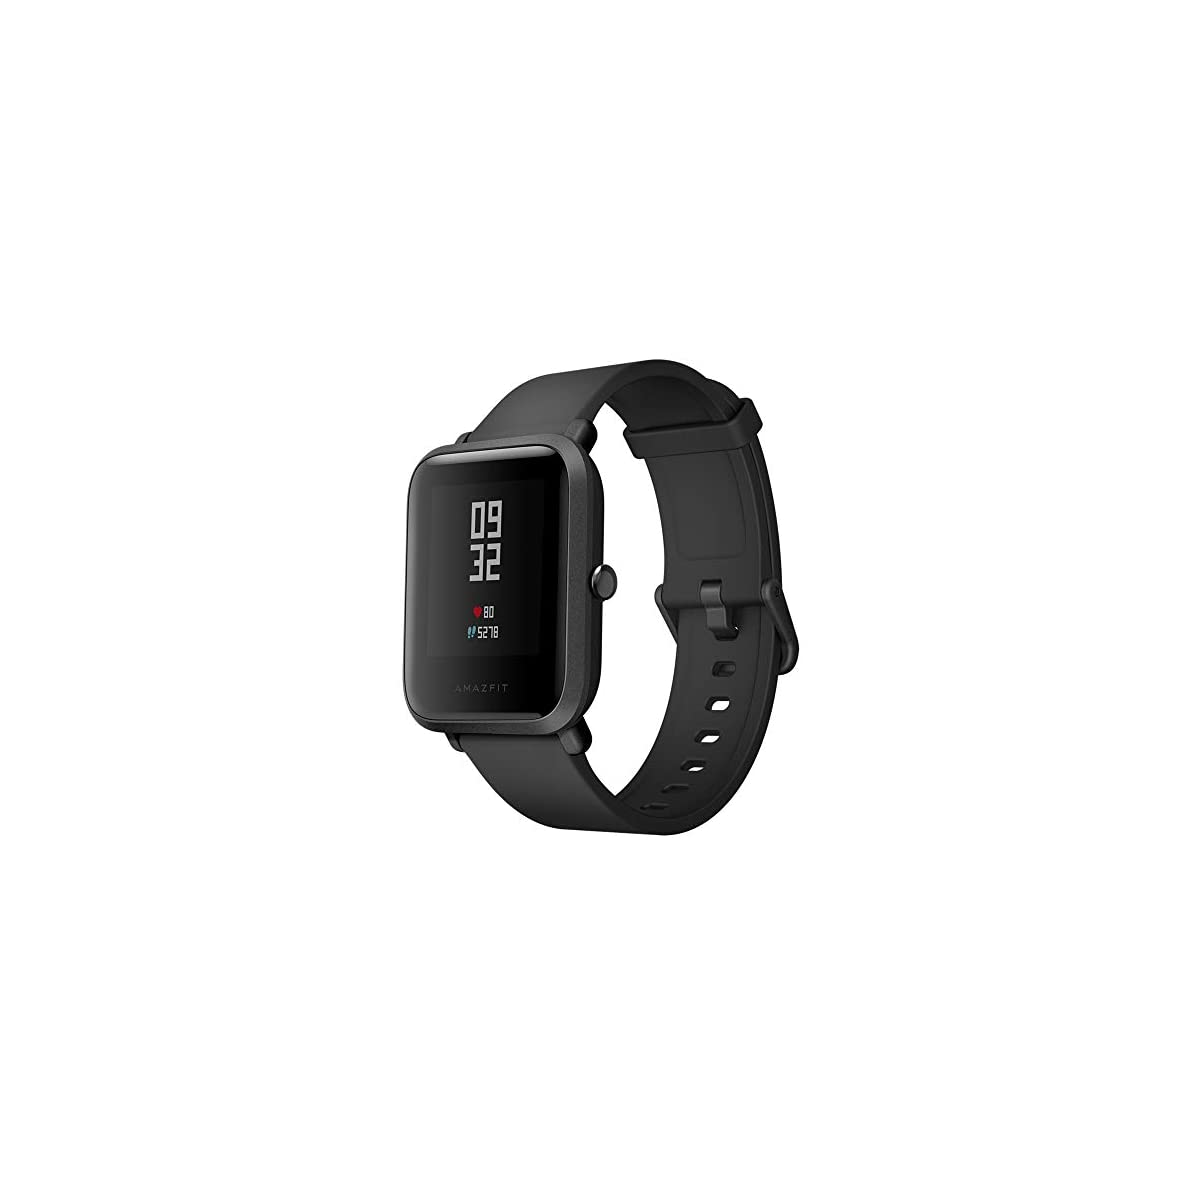 41AoWPJnnJL. SS1200  - EdwayBuy Smartwatch, Amazfit Bip Relojes Deportivos con GPS Bluetooth IP68 a Prueba de Agua Pantalla Táctil Monitor de Frecuencia Cardíaca 45 Días Batería Ultra Larga Vida Versión Global Negro